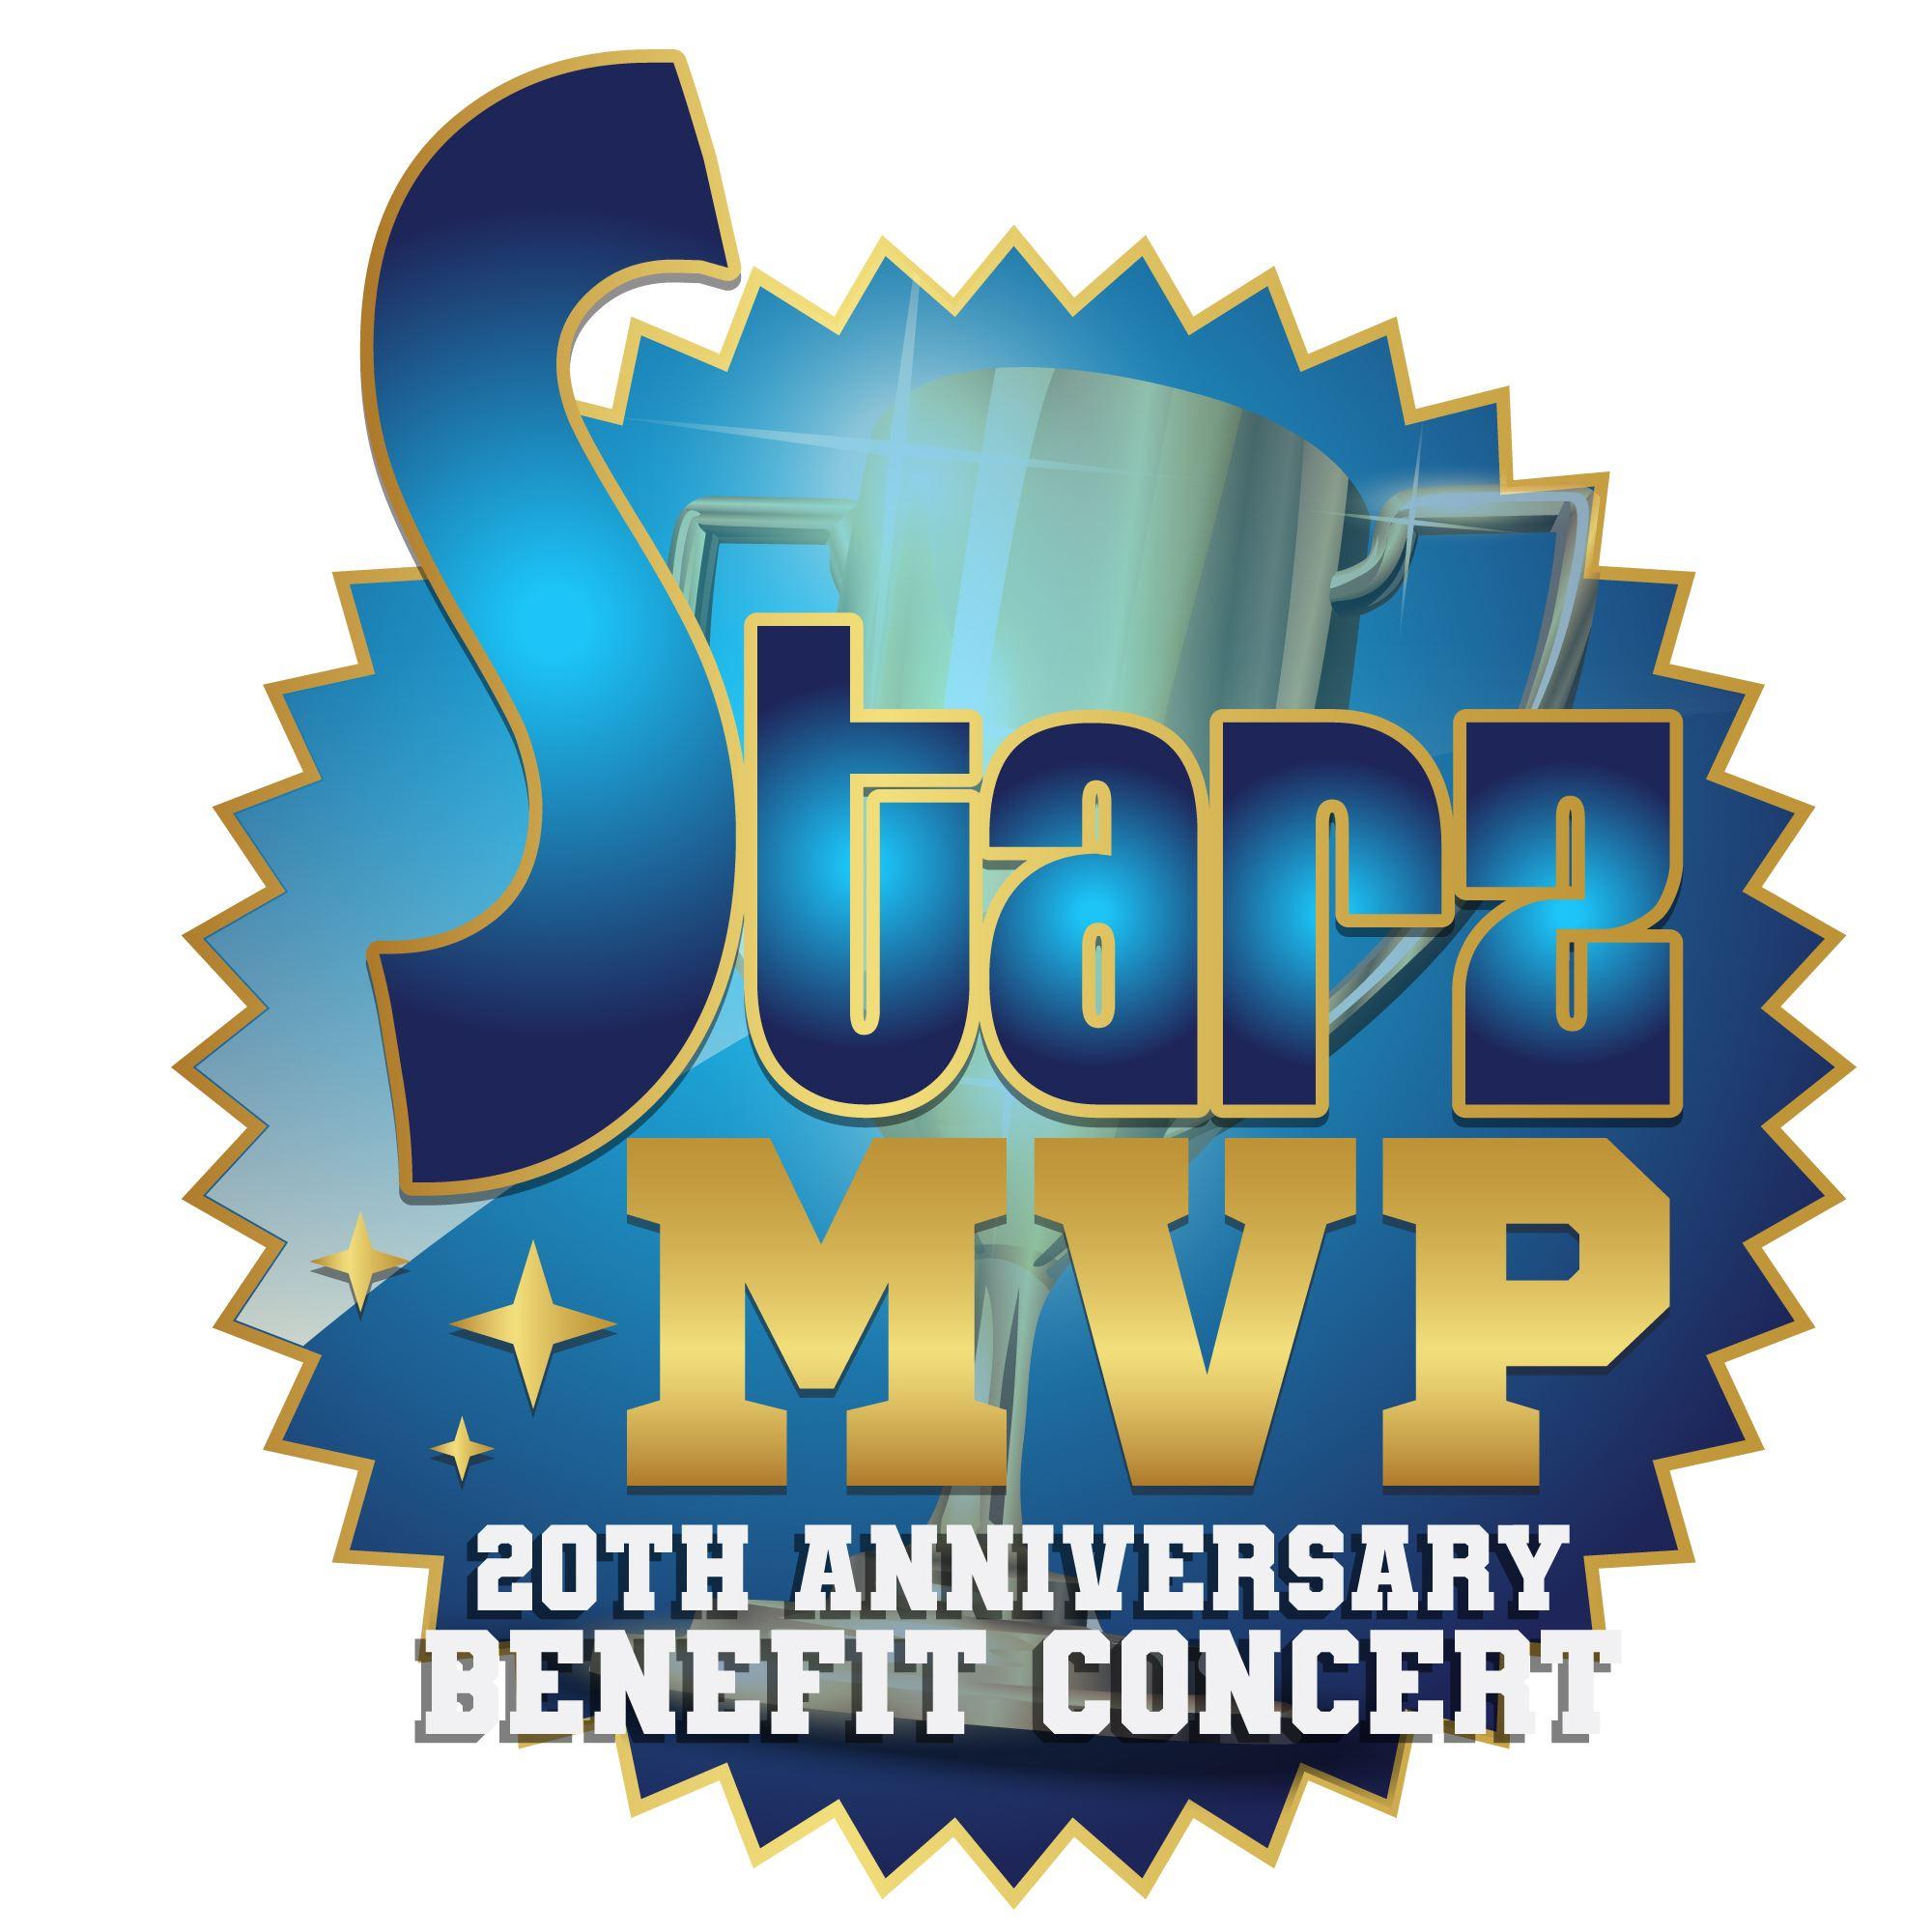 Starz MVP 20th Anniversary Benefit Concert